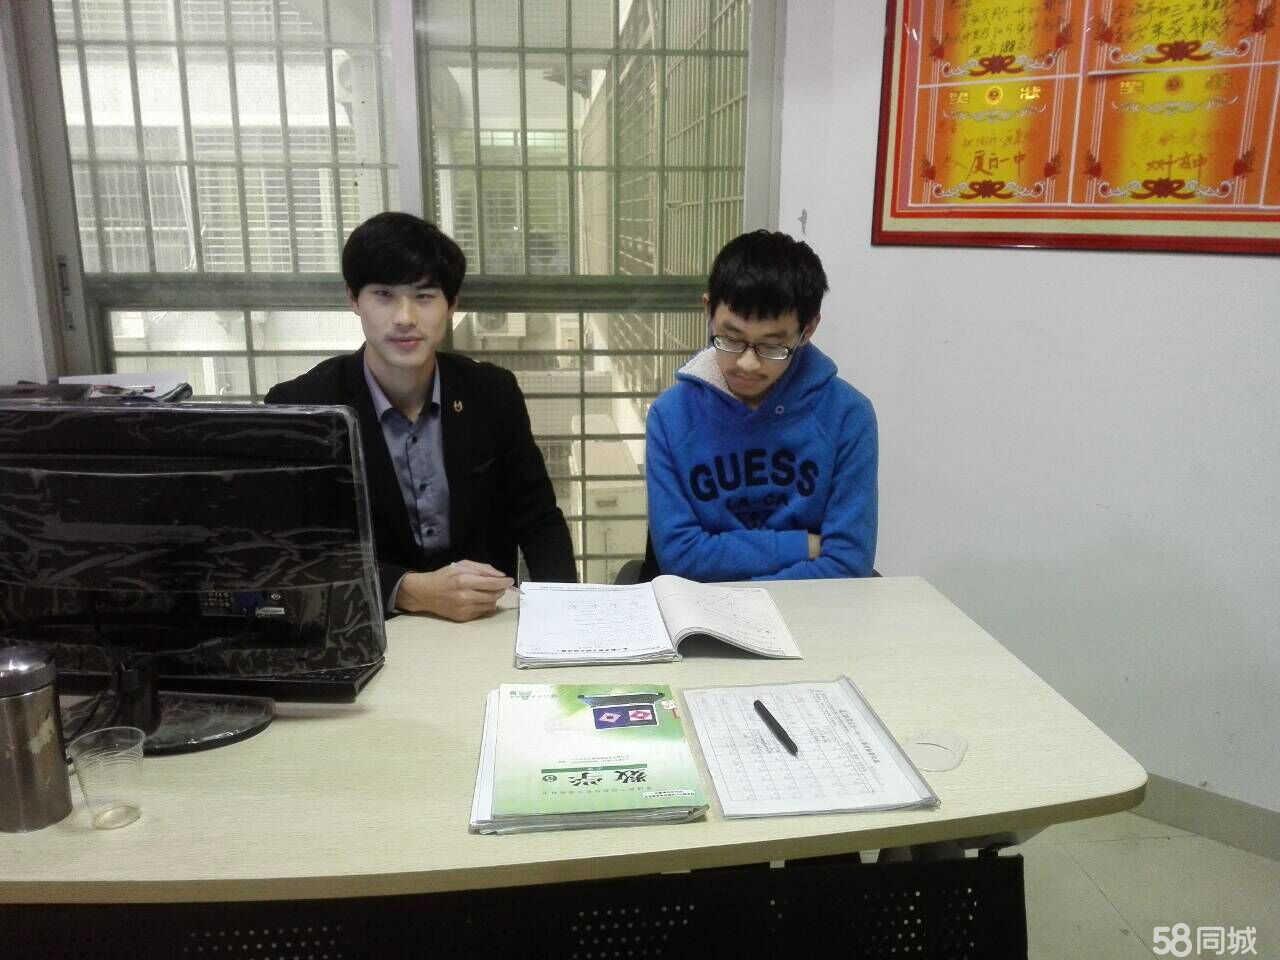 sm补习班招v初中英语初中老师150制等级分如何分图片